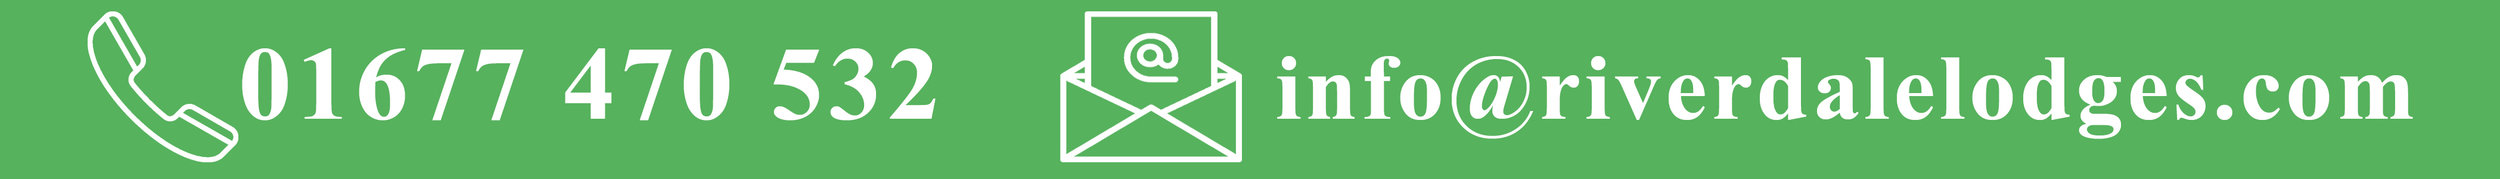 BANNER phone+email symbols.jpg